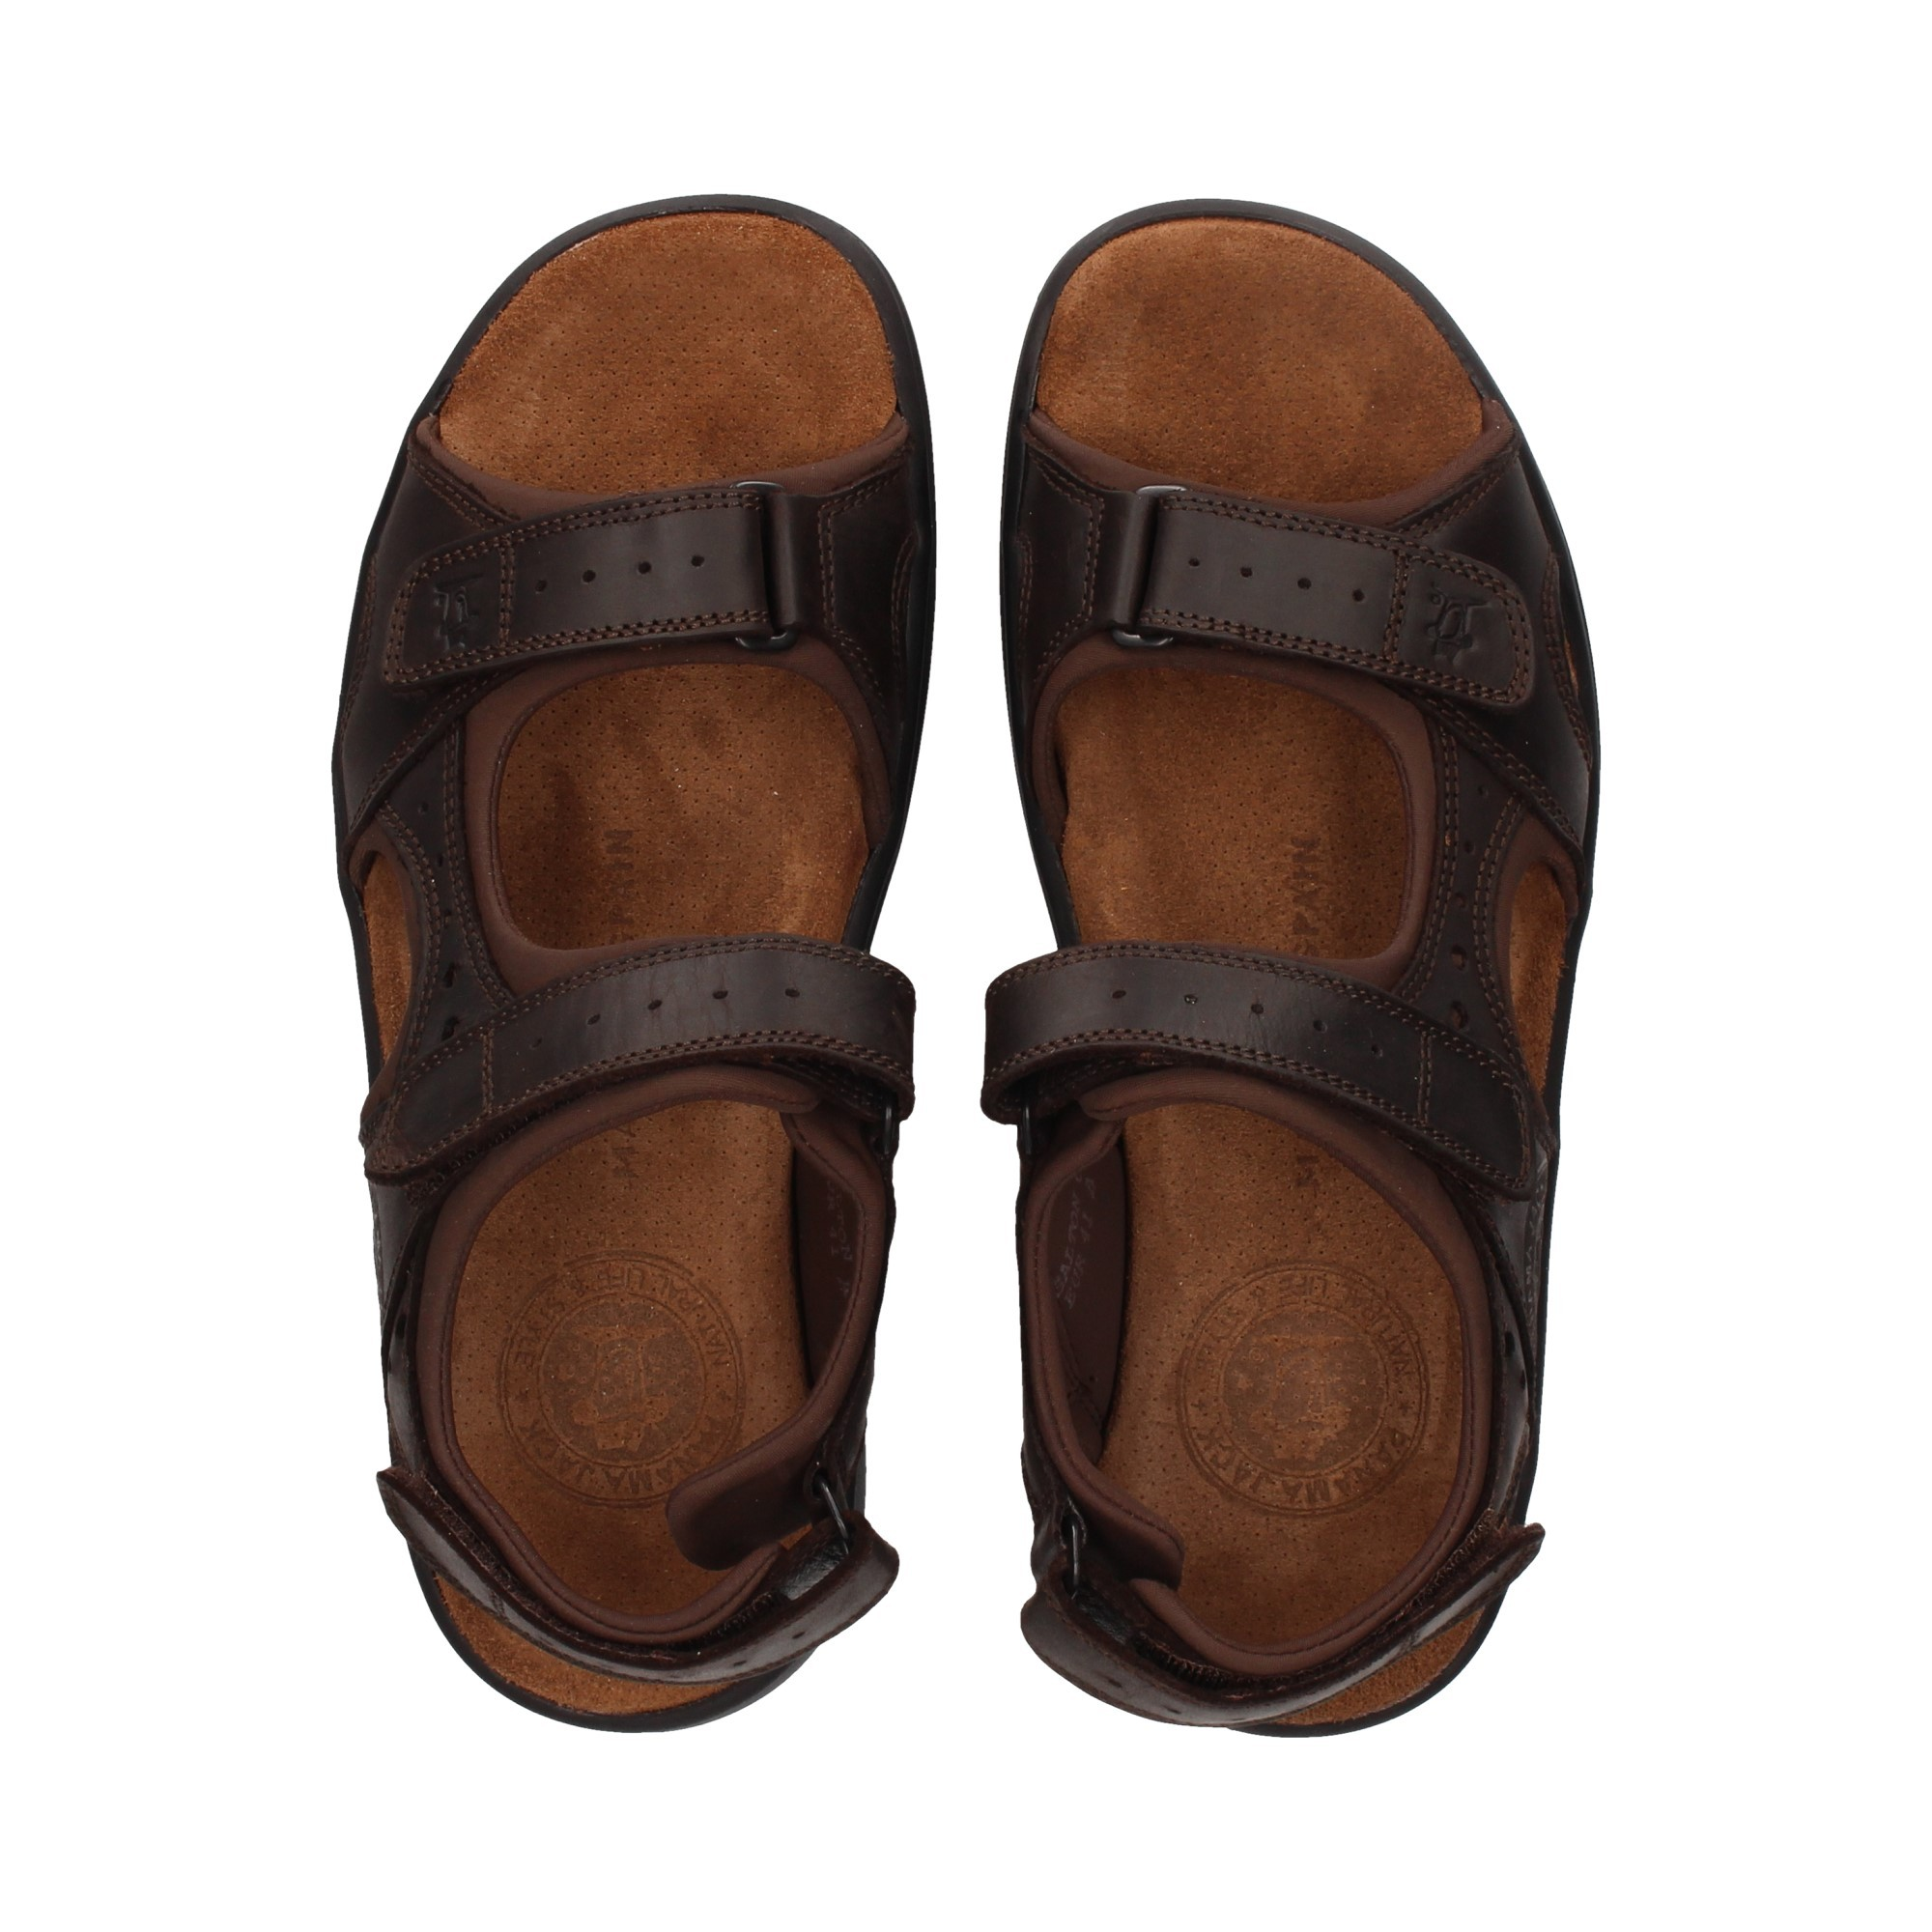 sandalia-surfera-napa-grass-marron